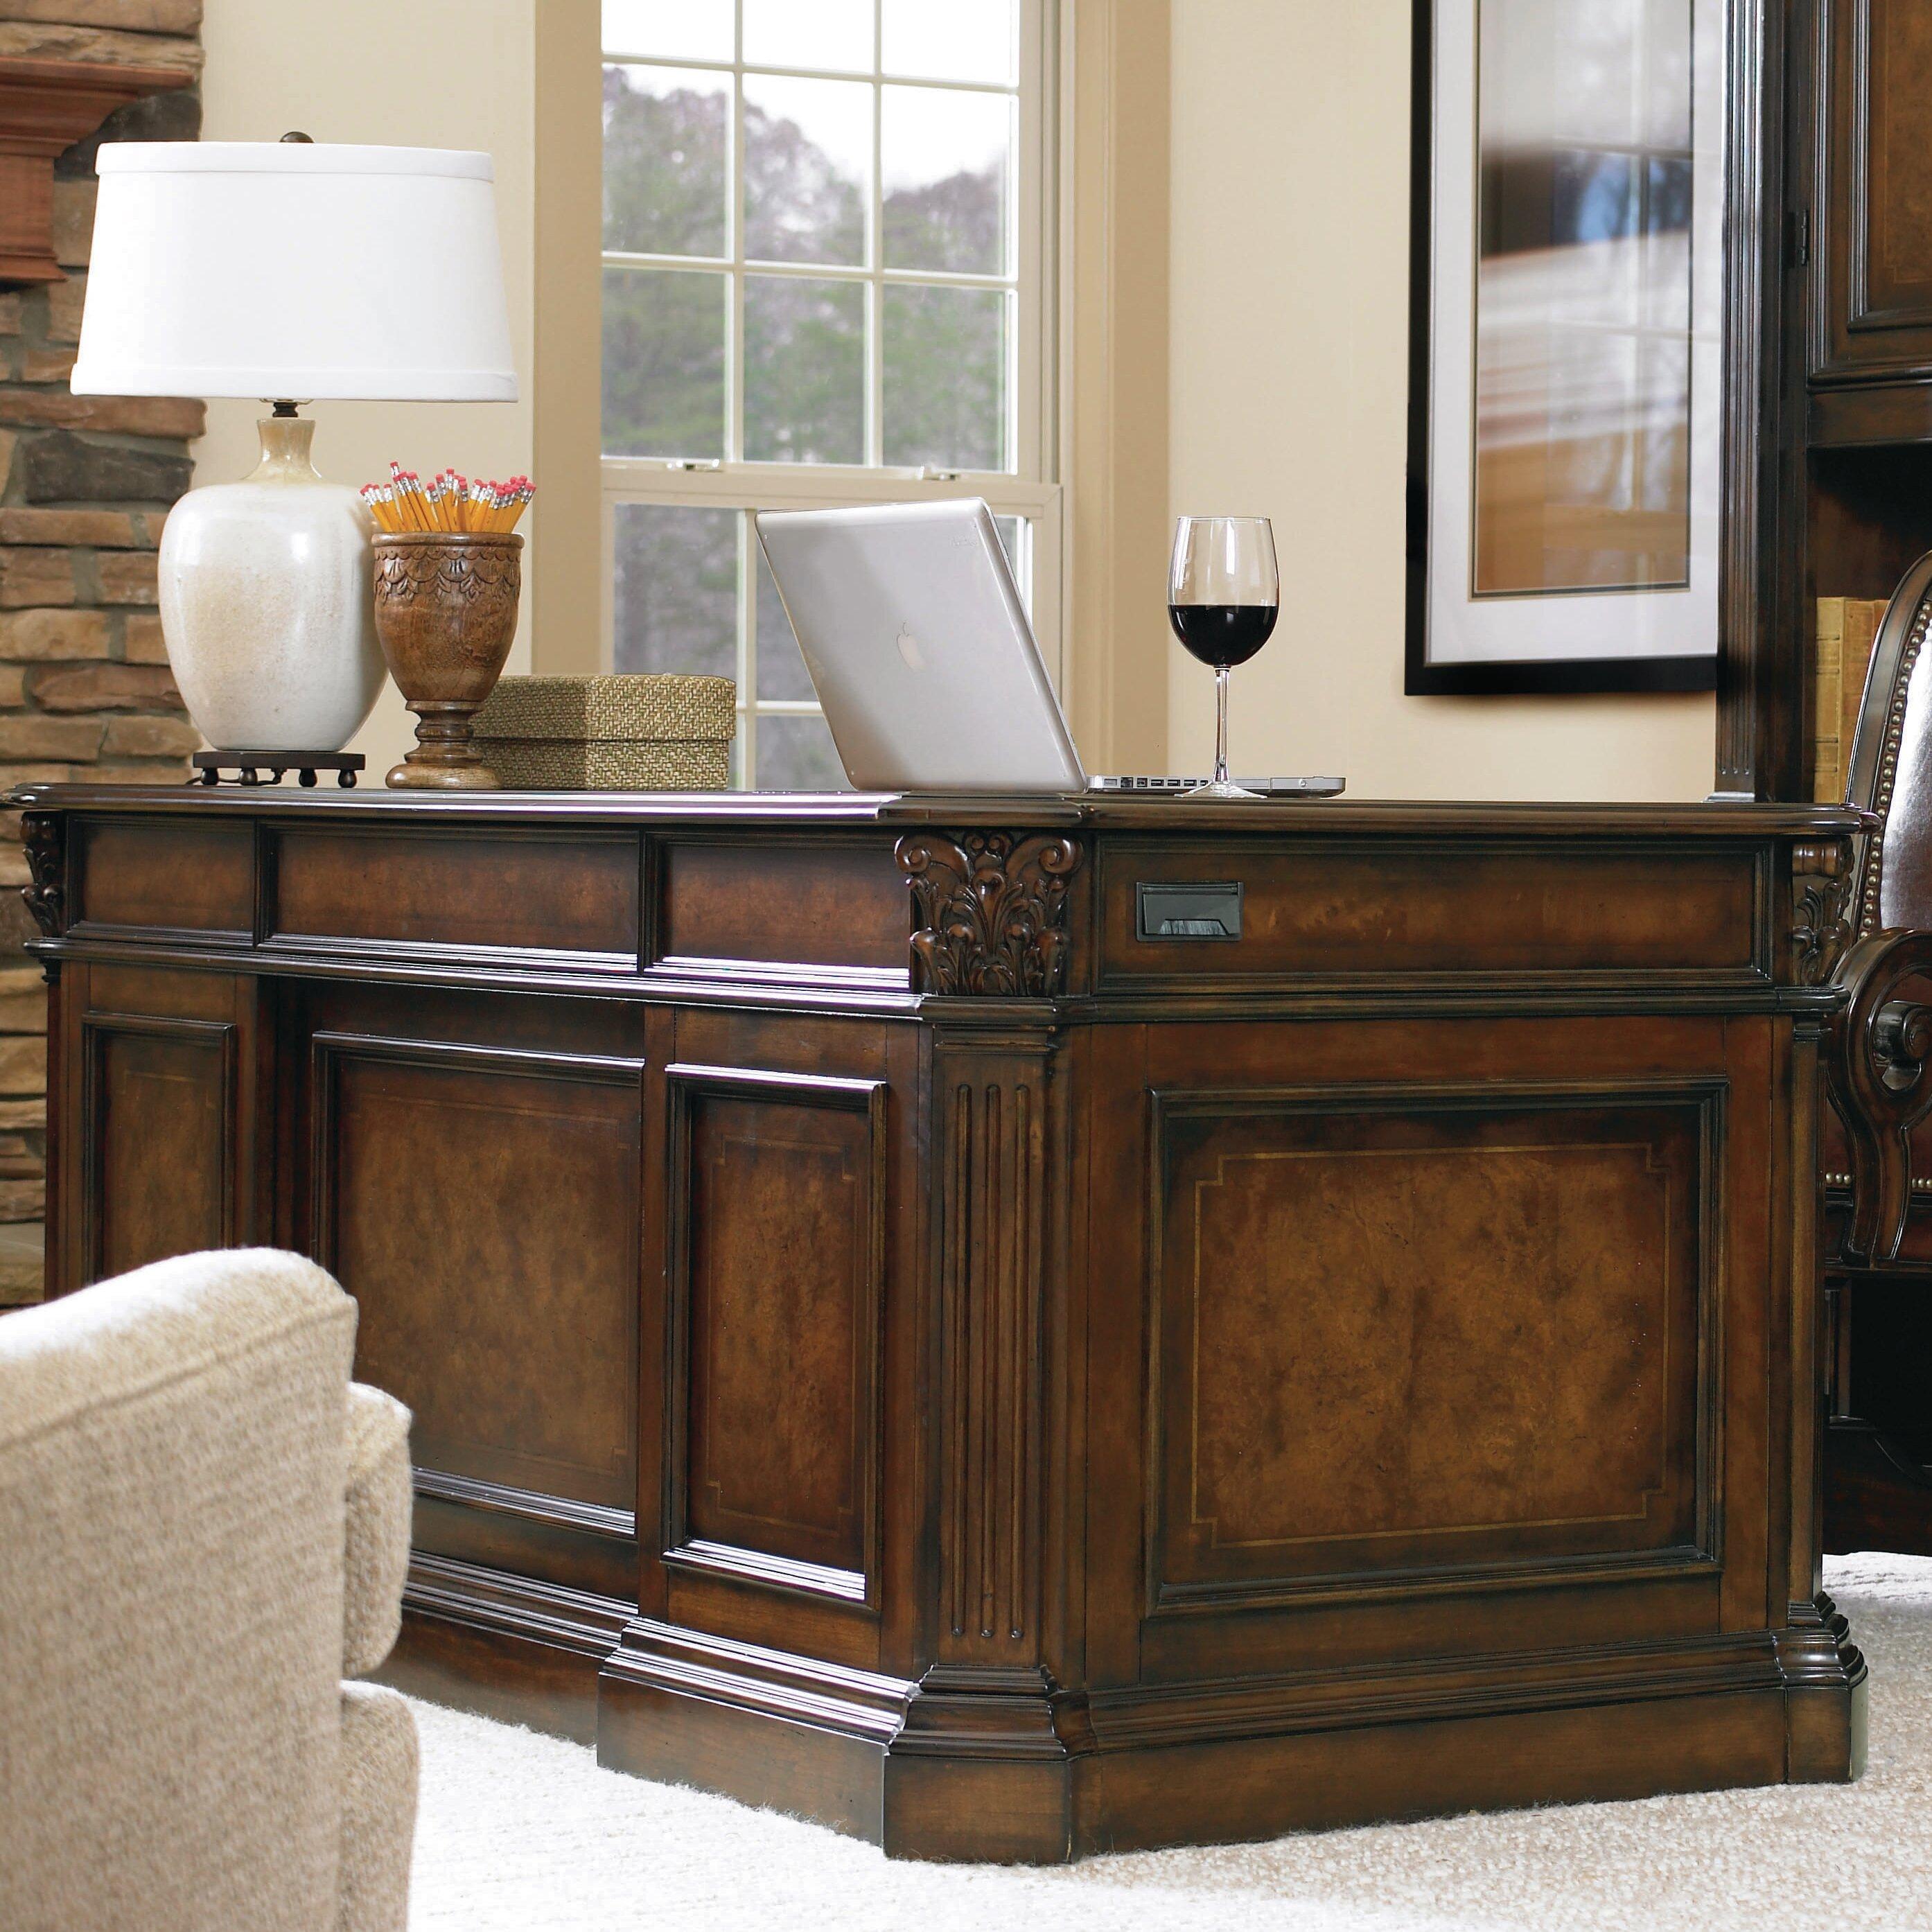 Hooker Furniture European Renaissance Ii Executive Desk With Kneehole